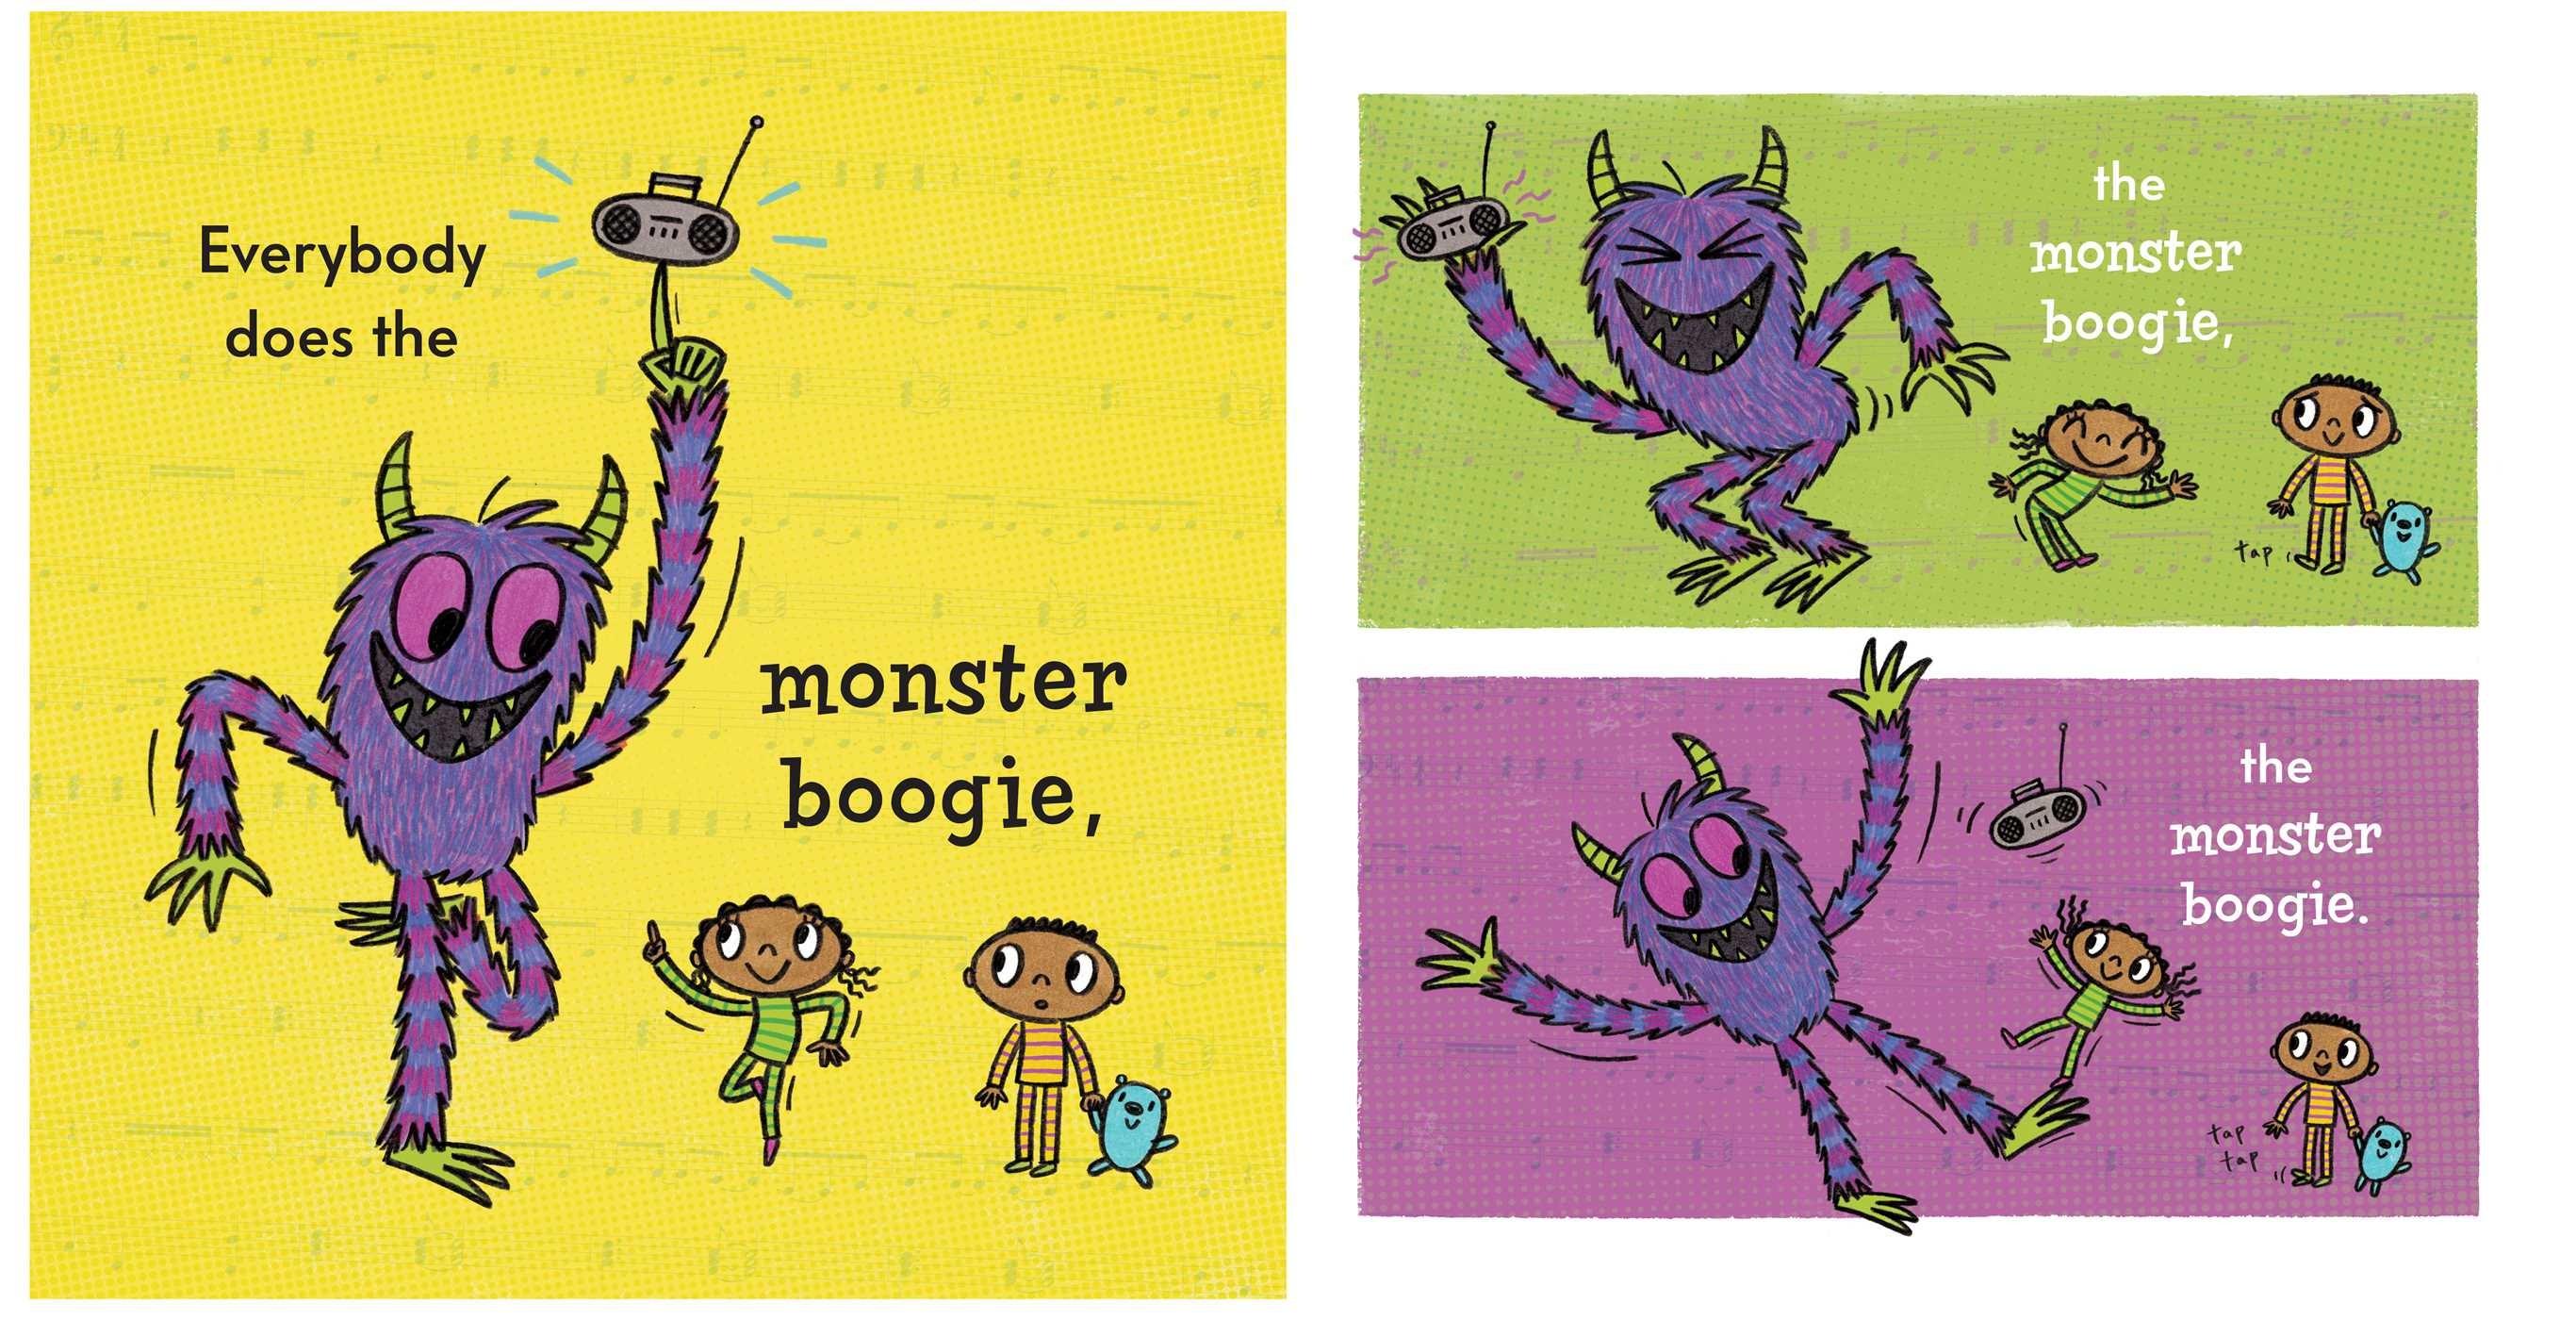 Monster boogie 9781481464659.in06